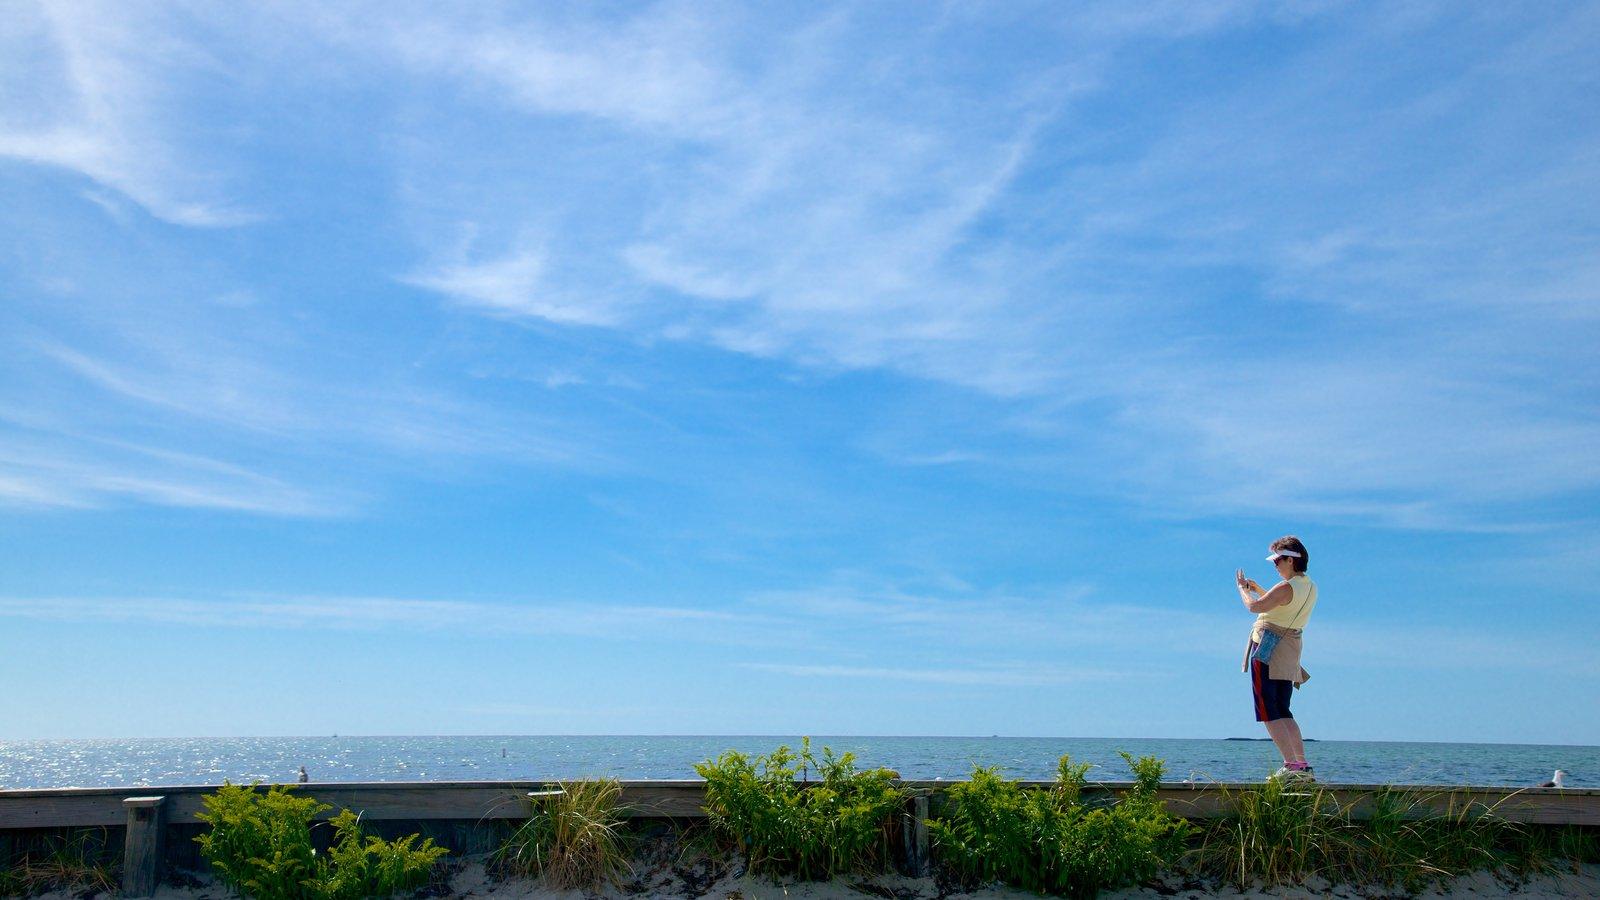 West Dennis Beach which includes general coastal views as well as an individual femail